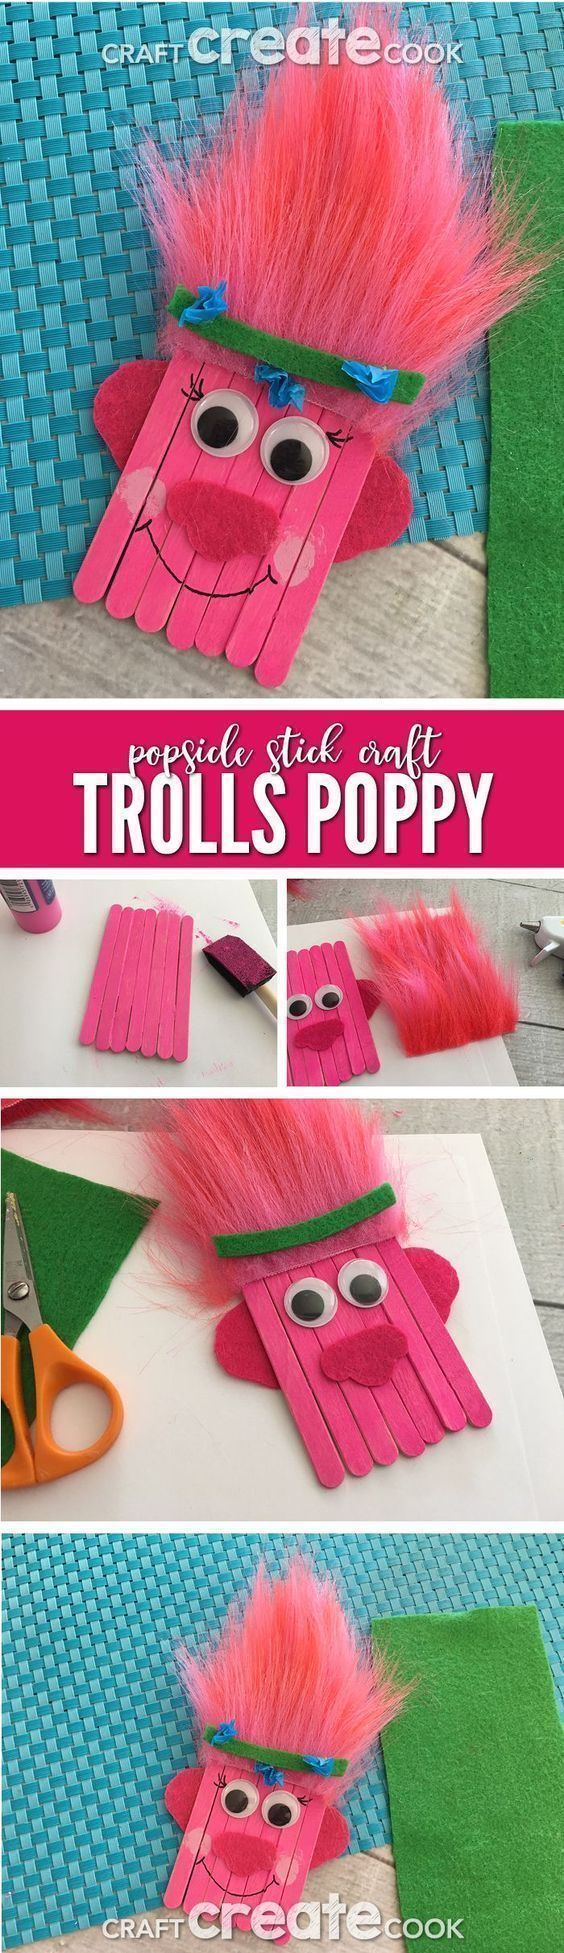 Trolls Poppy Popsicle Stick Craft for Kids   Troll #Cook #Craft #Create #Kids #poppy #Popsicle #Stick #Trolls #poppycraftsforkids Trolls Poppy Popsicle Stick Craft for Kids   Troll #Cook #Craft #Create #Kids #poppy #Popsicle #Stick #Trolls #poppycraftsforkids Trolls Poppy Popsicle Stick Craft for Kids   Troll #Cook #Craft #Create #Kids #poppy #Popsicle #Stick #Trolls #poppycraftsforkids Trolls Poppy Popsicle Stick Craft for Kids   Troll #Cook #Craft #Create #Kids #poppy #Popsicle #Stick #Trolls #poppycraftsforkids